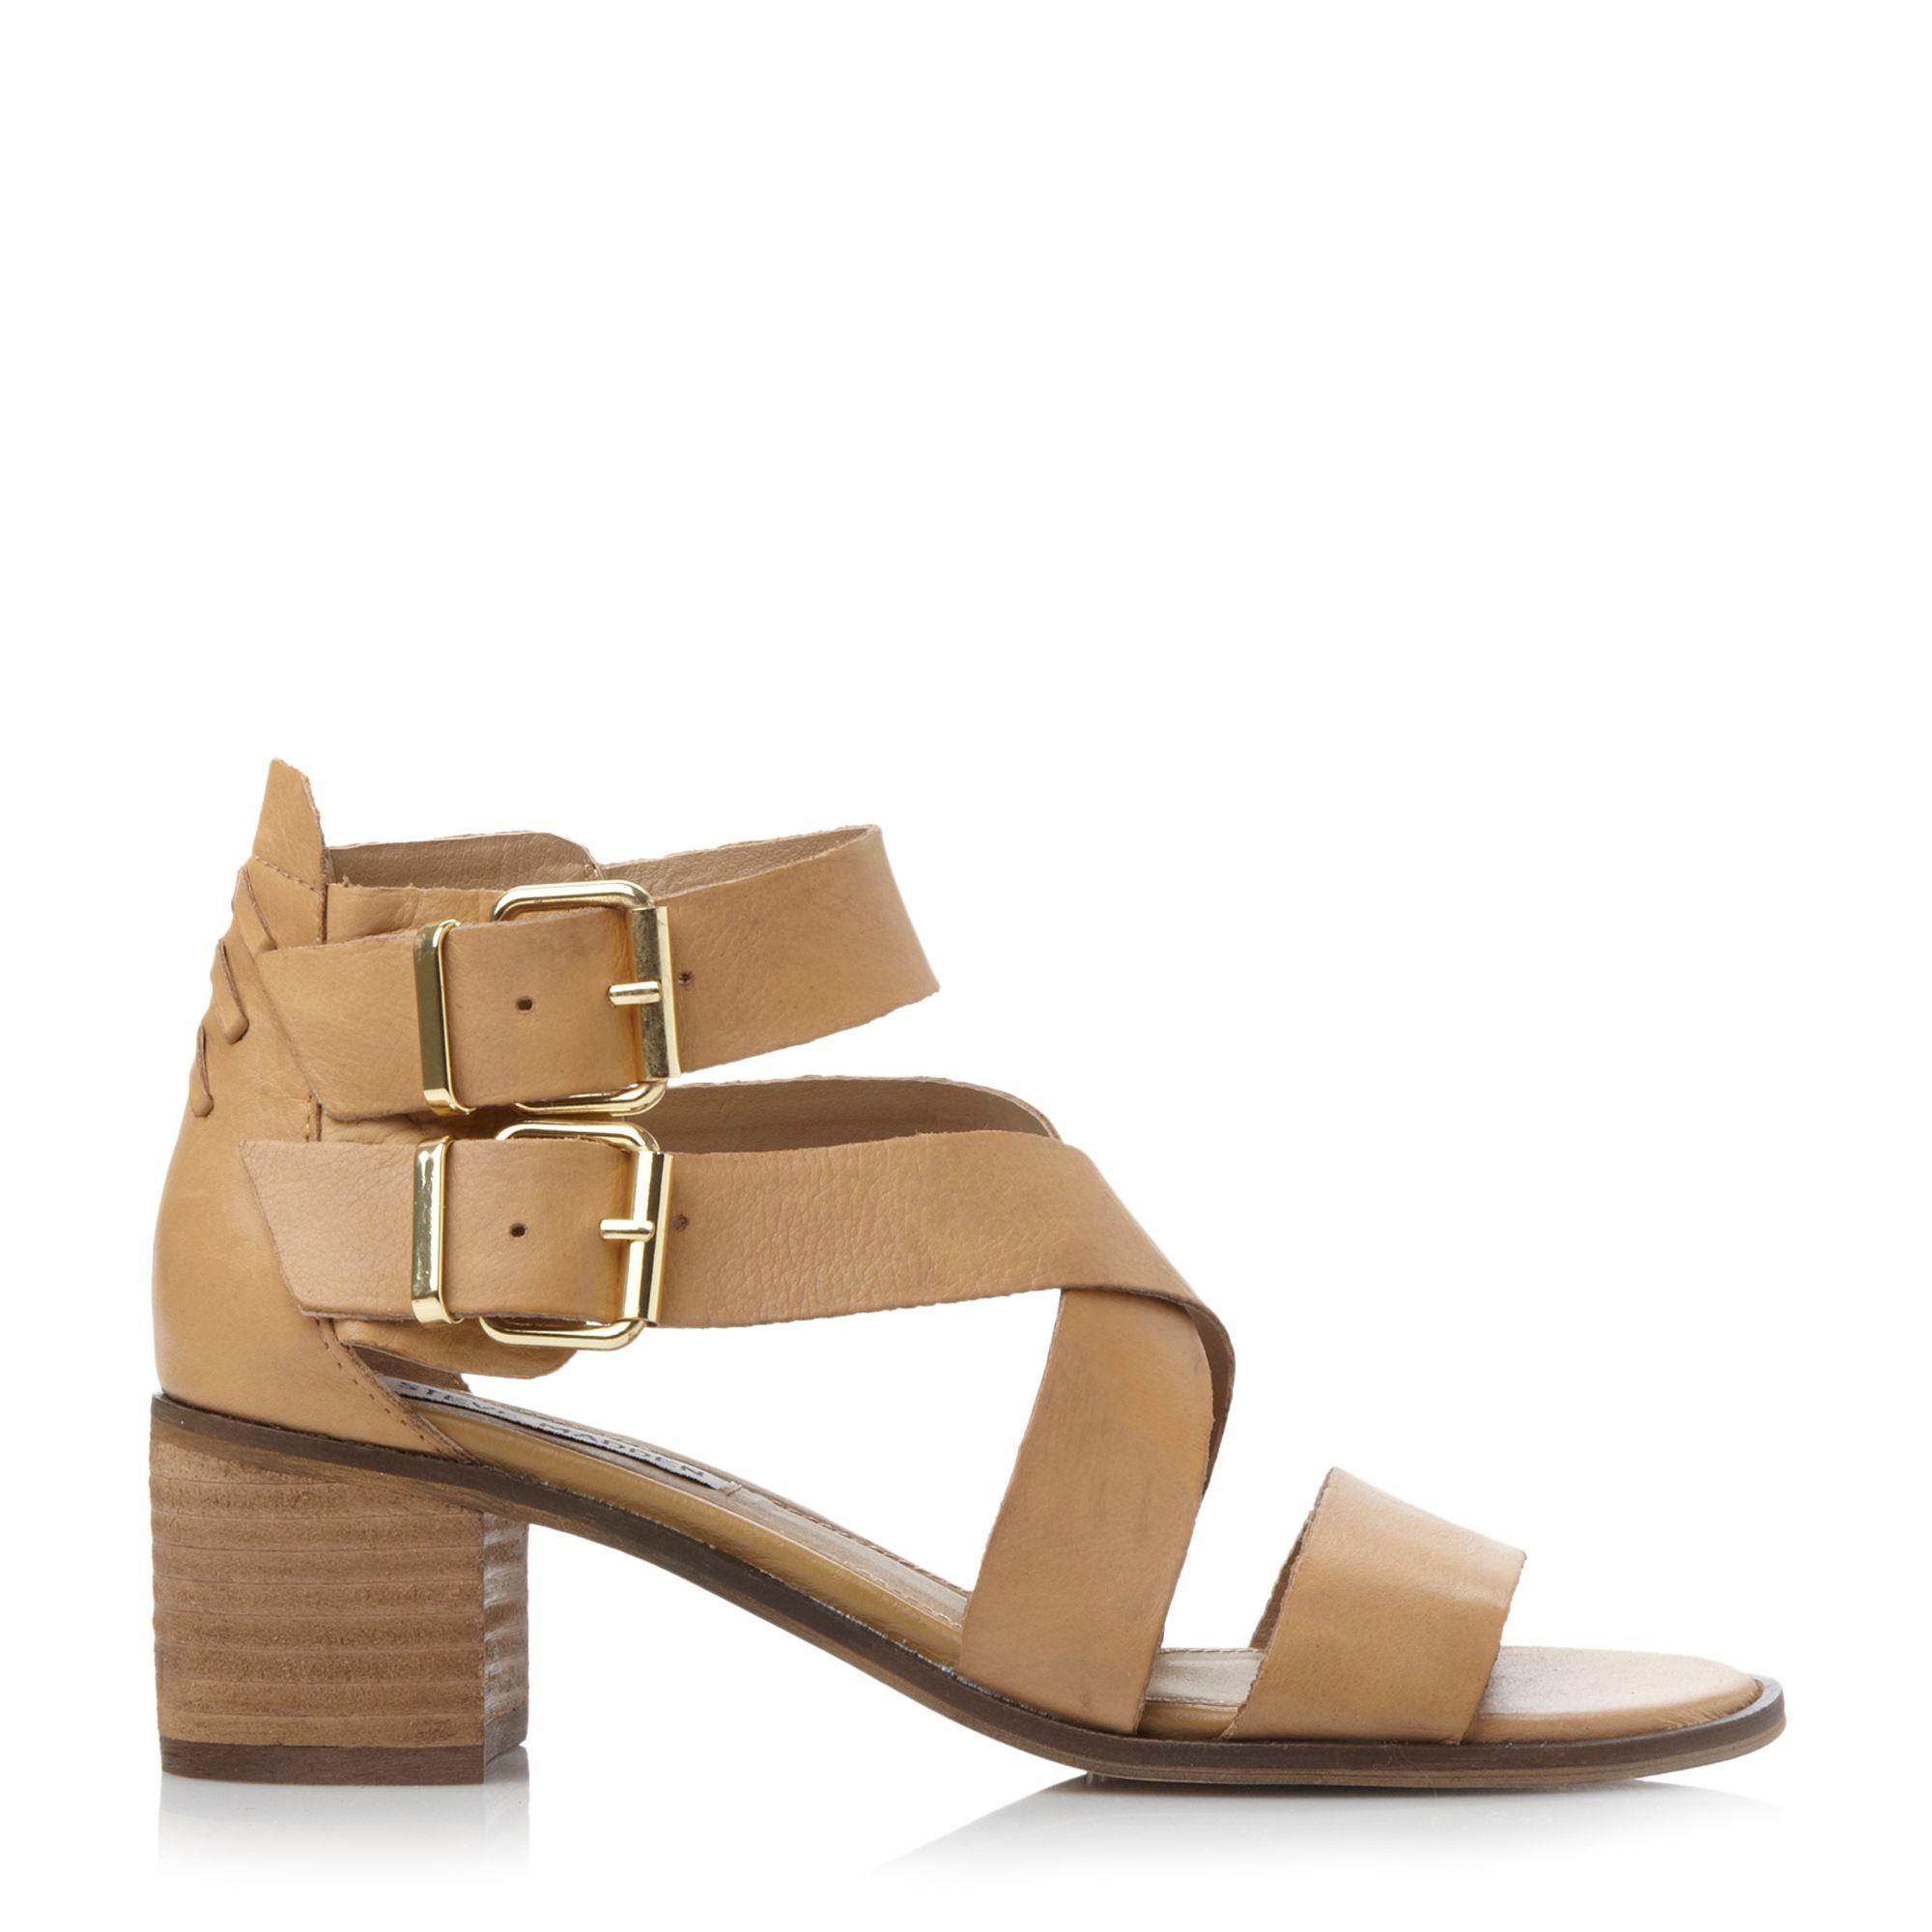 Steve madden Rosana Sm Strappy Block Heel Sandal in Natural  Lyst